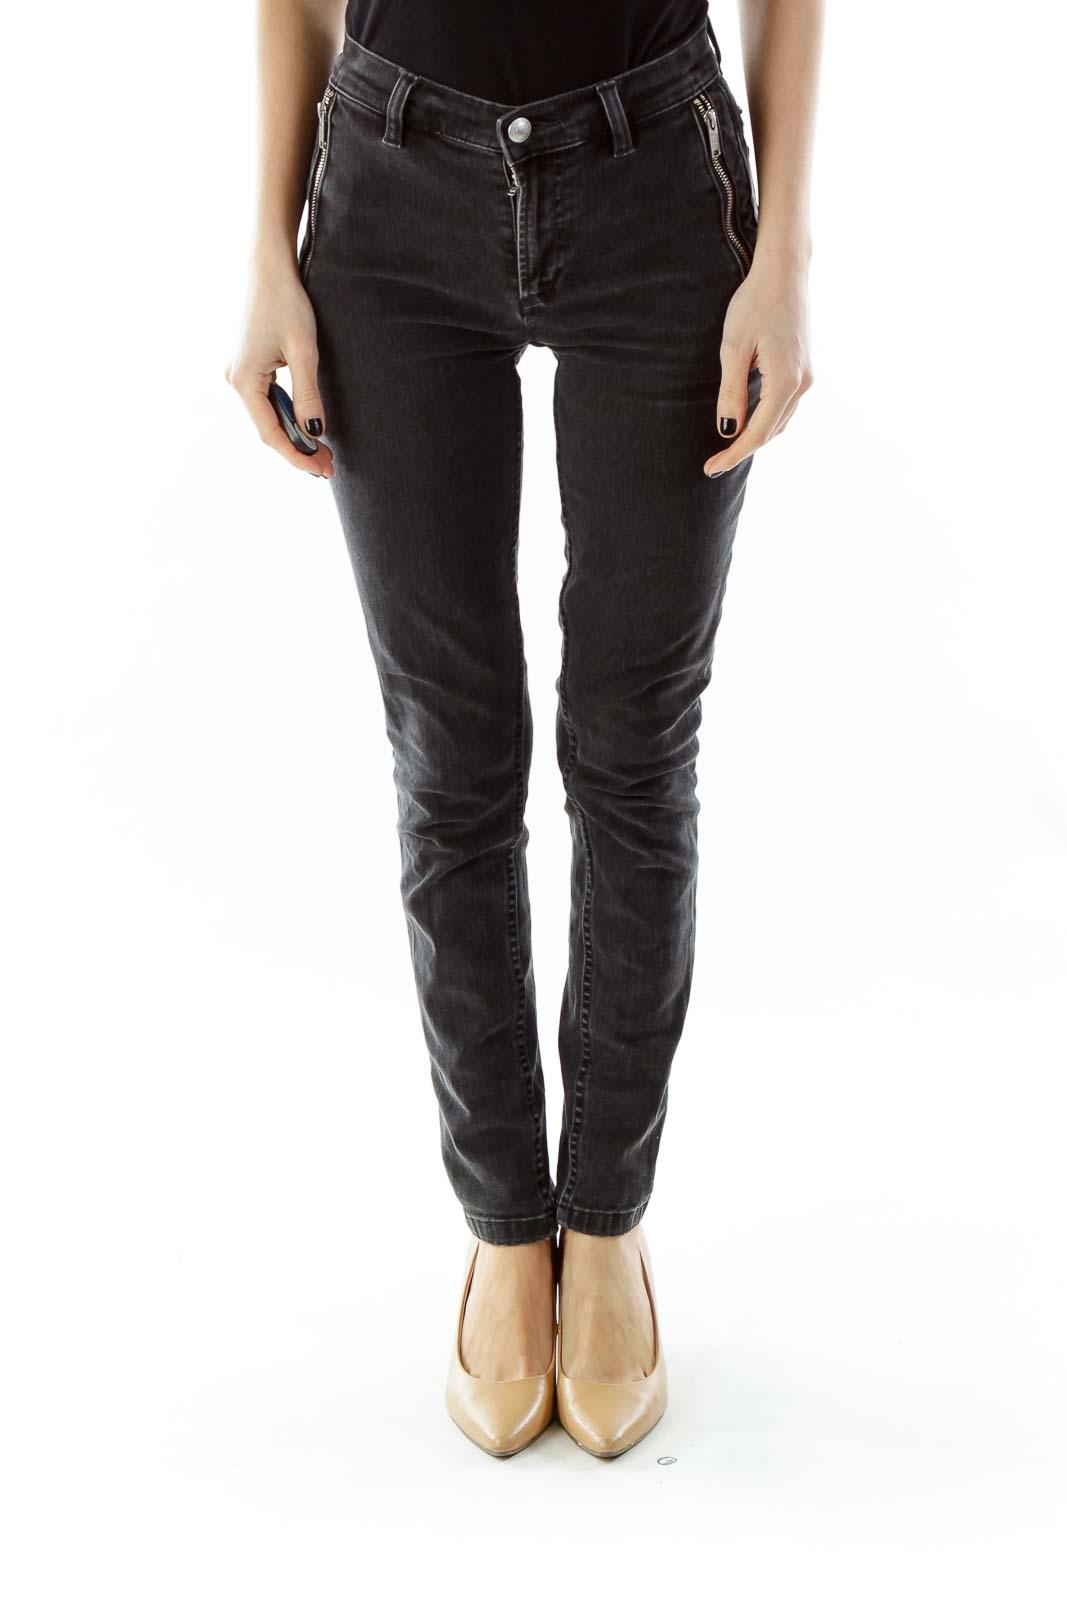 Black Zippered Skinny Jeans